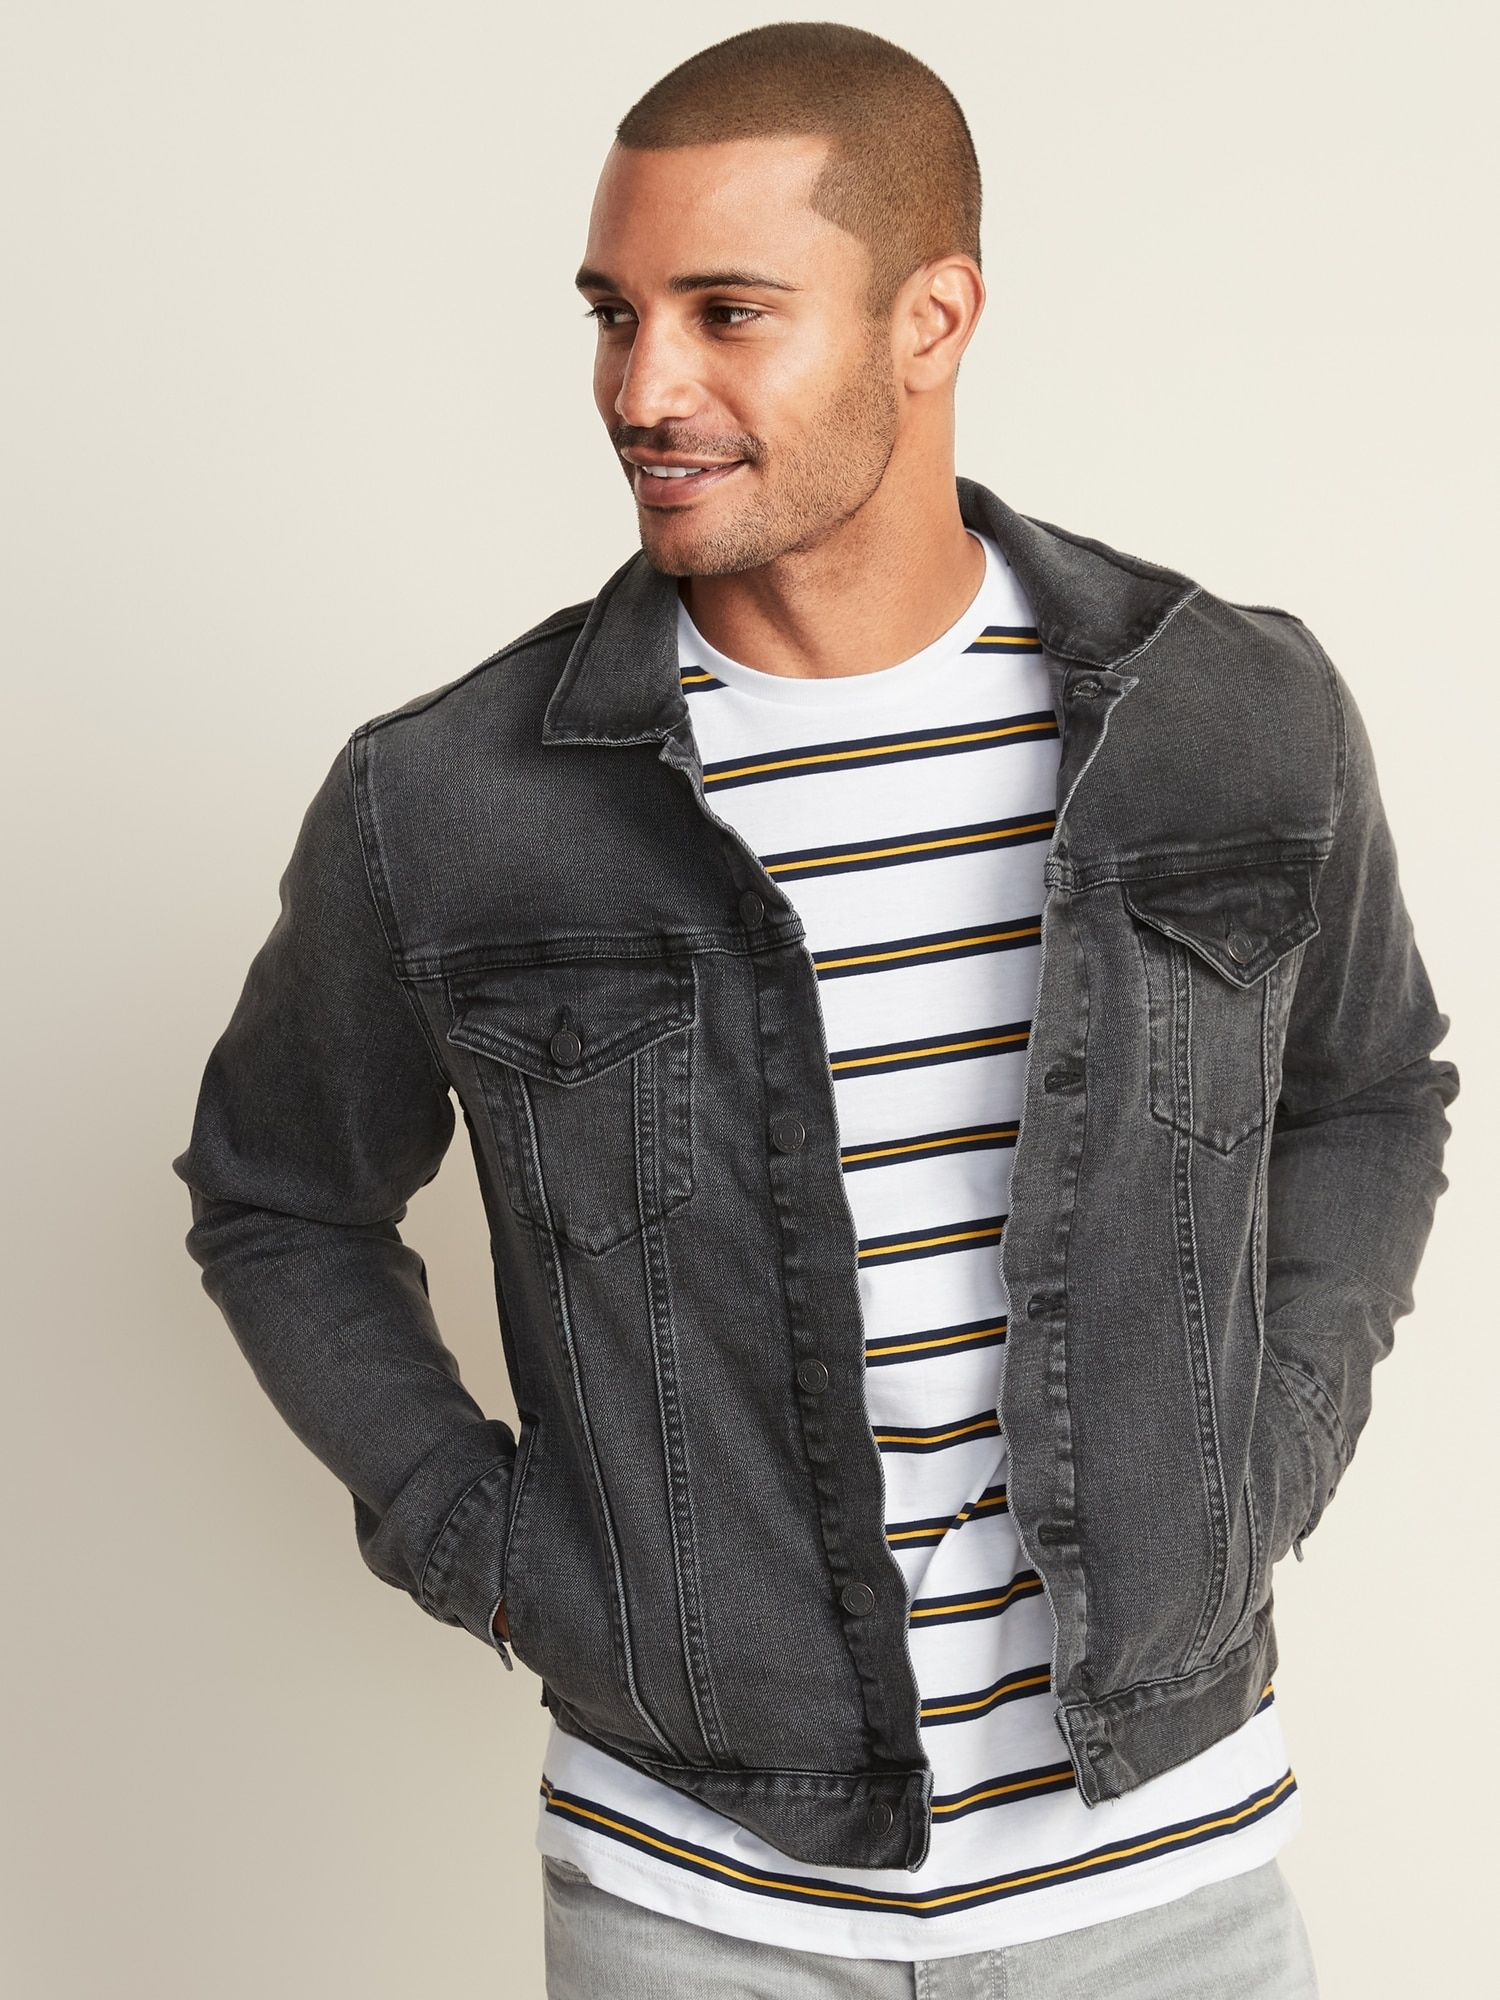 BuiltIn Tough Black Jean Jacket For Men in 2020 Denim